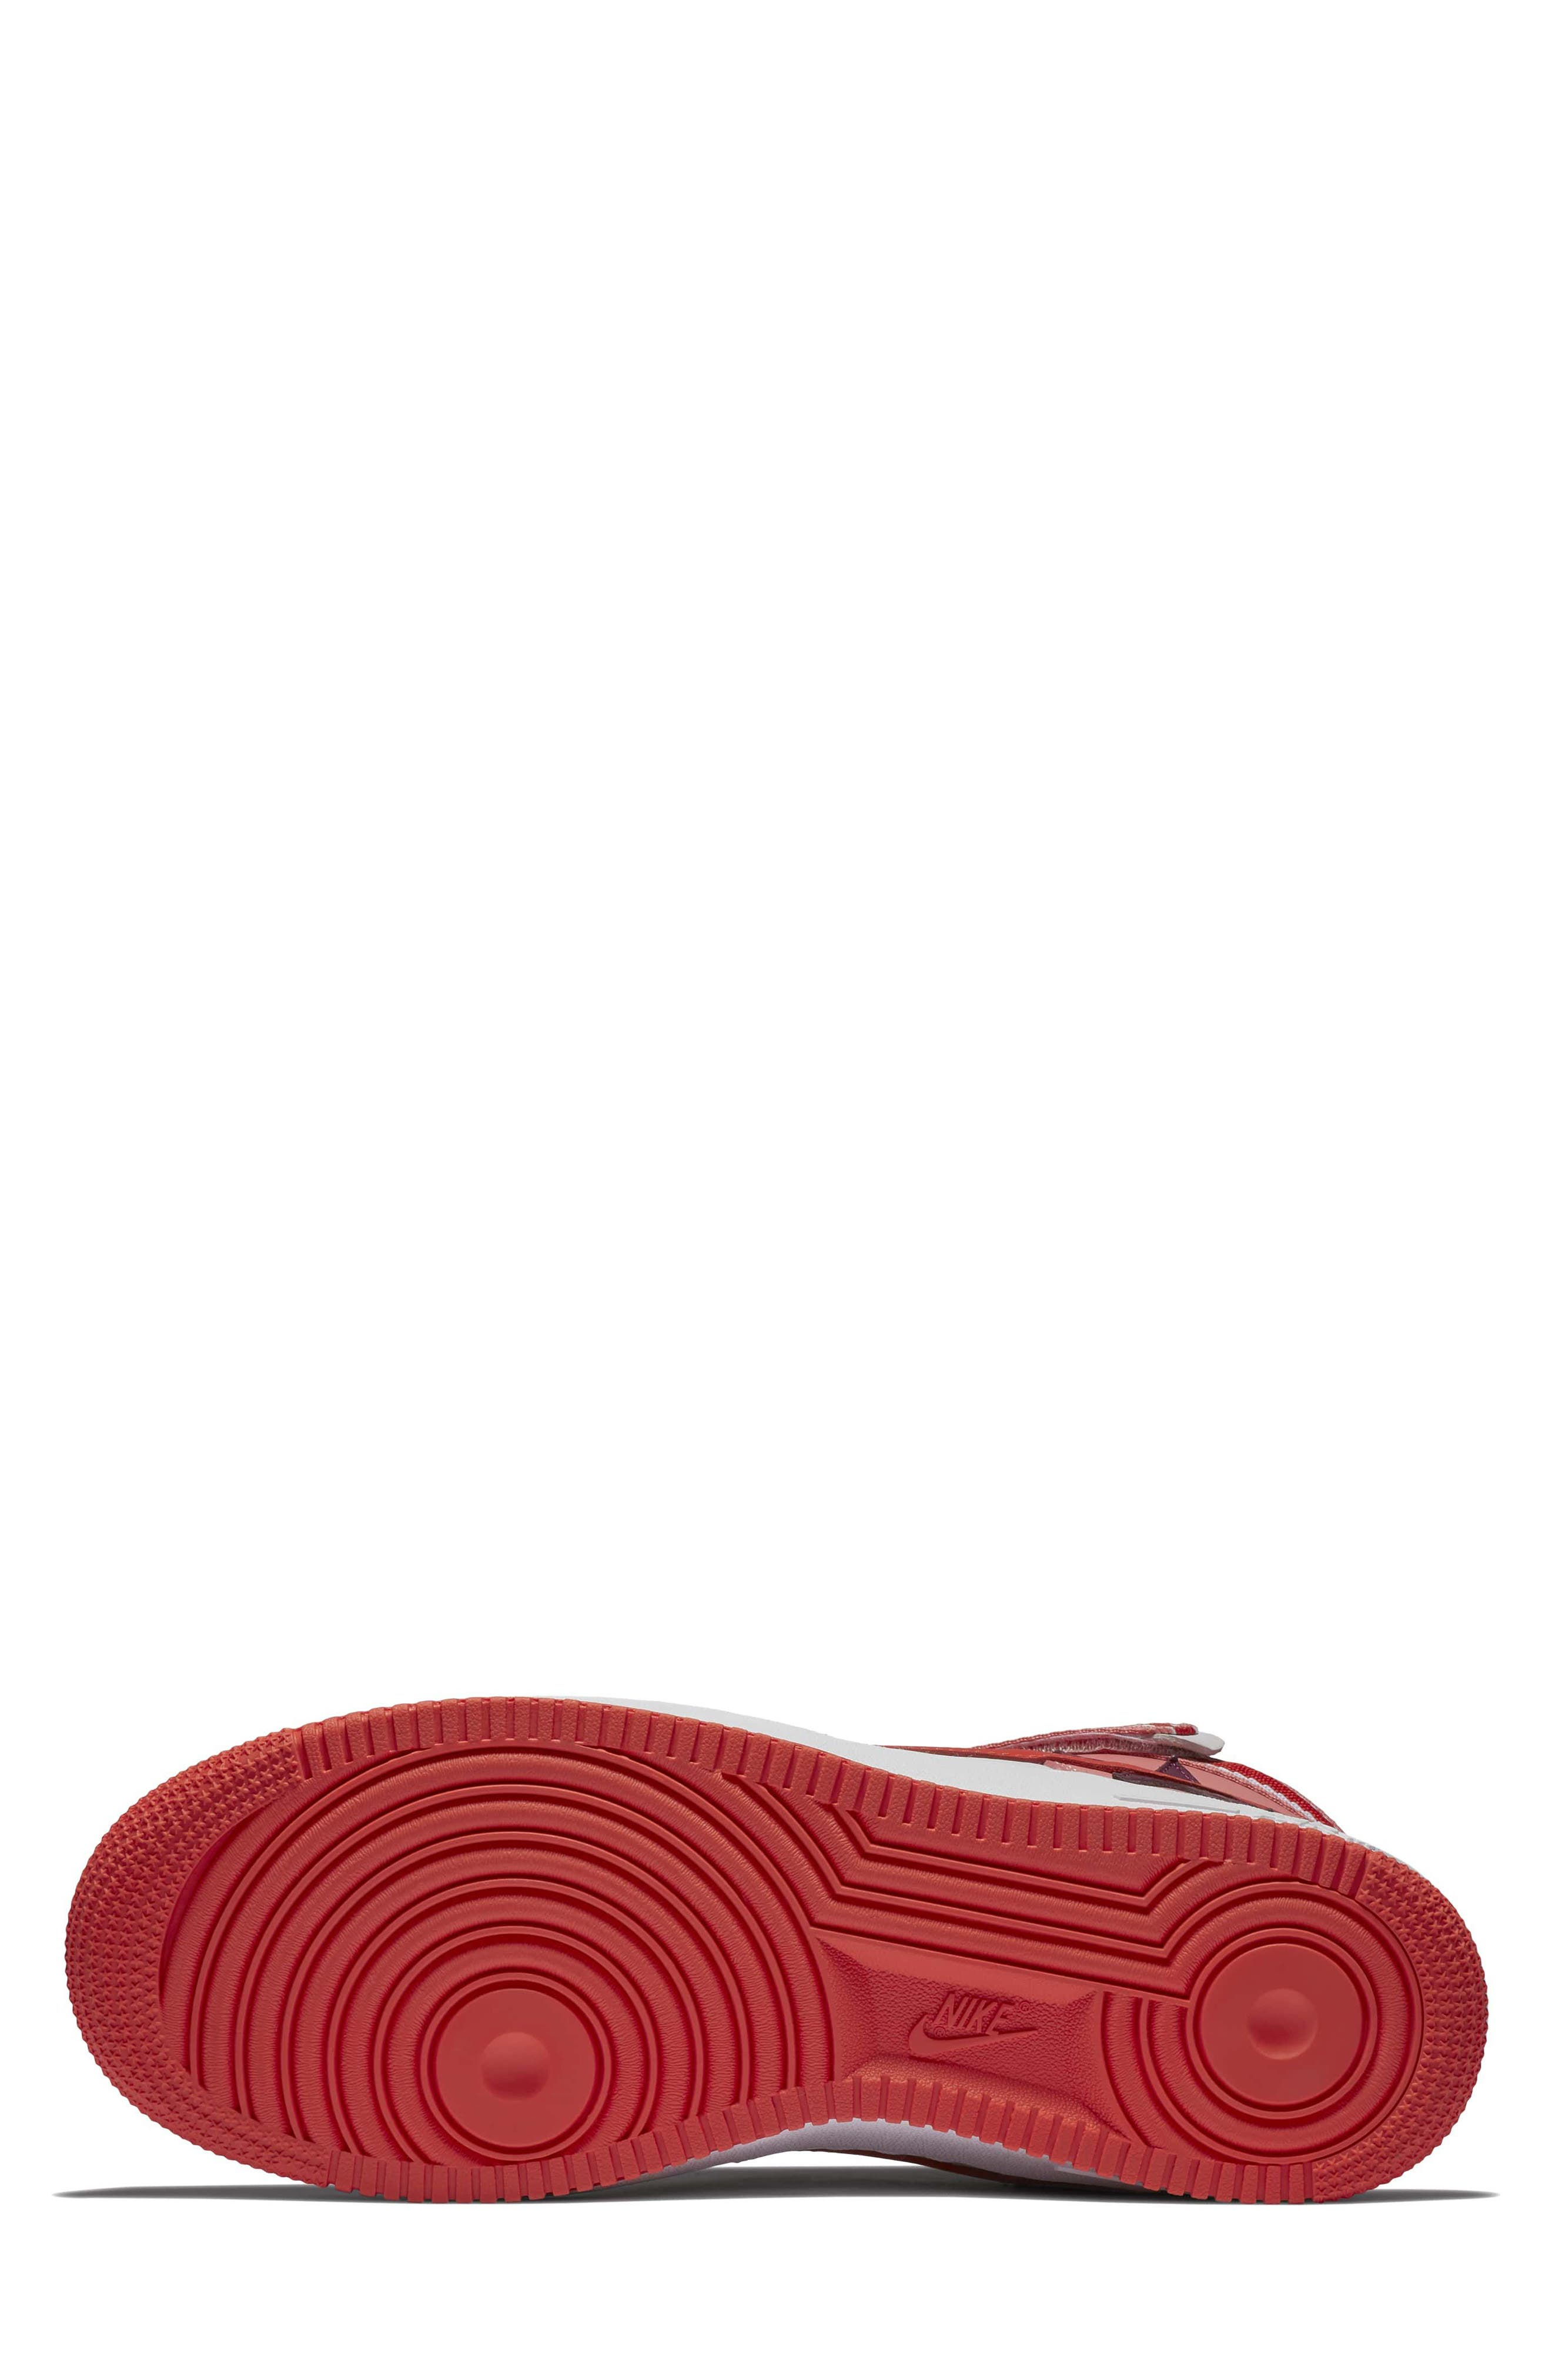 Air Force 1 High RT Sneaker,                             Alternate thumbnail 5, color,                             Coral/ Bordeax/ Orange/ Black